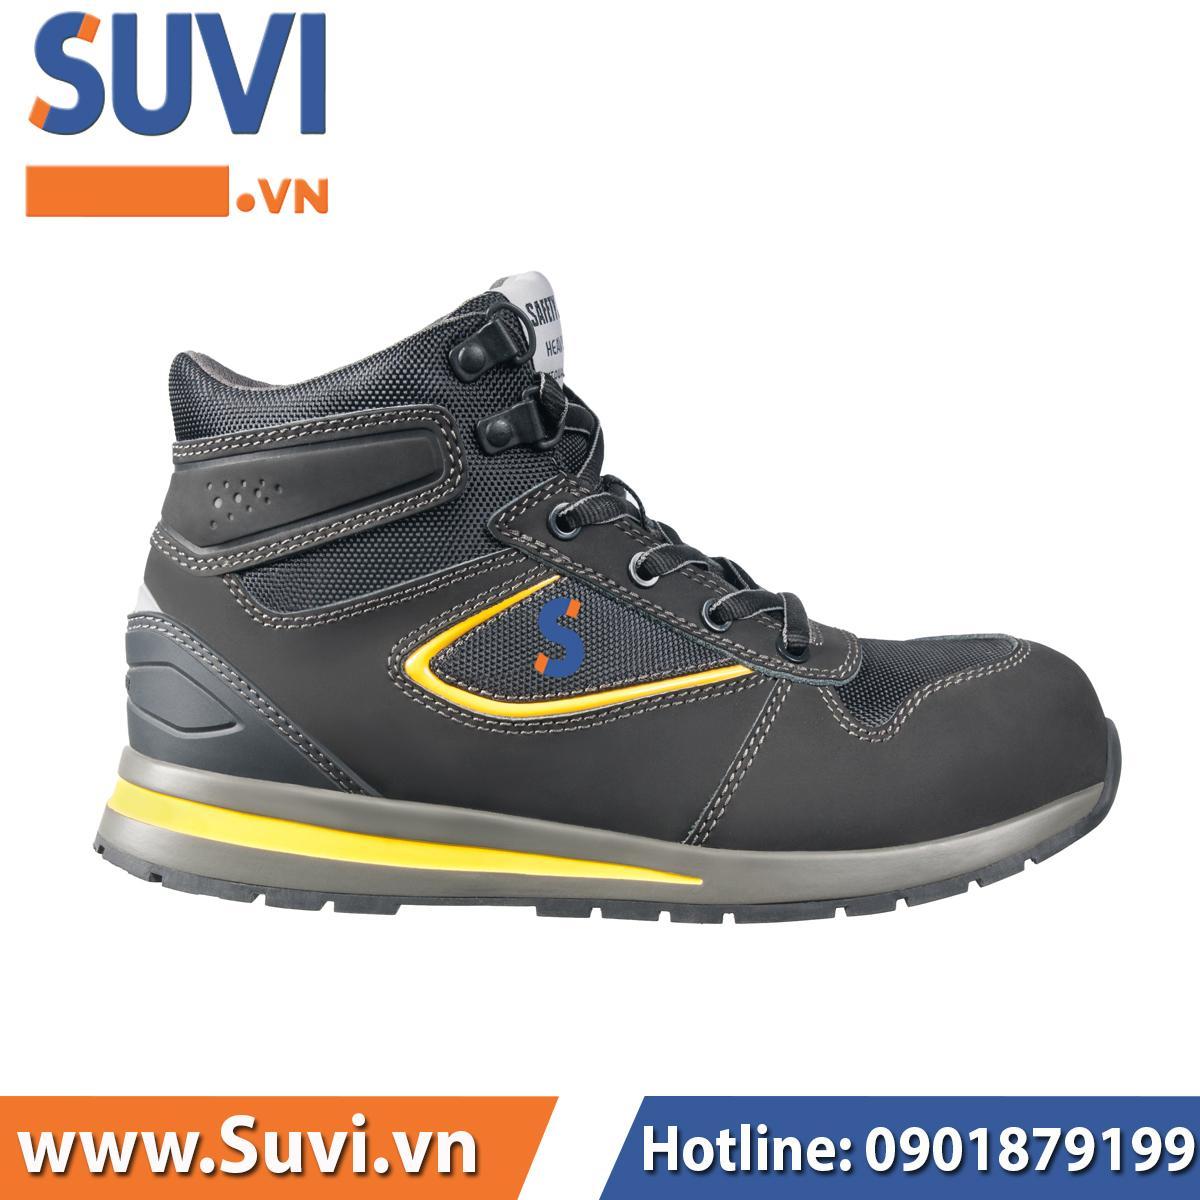 Giày Bảo Hộ Thời Trang Safety Jogger Speedy S3 Size 40